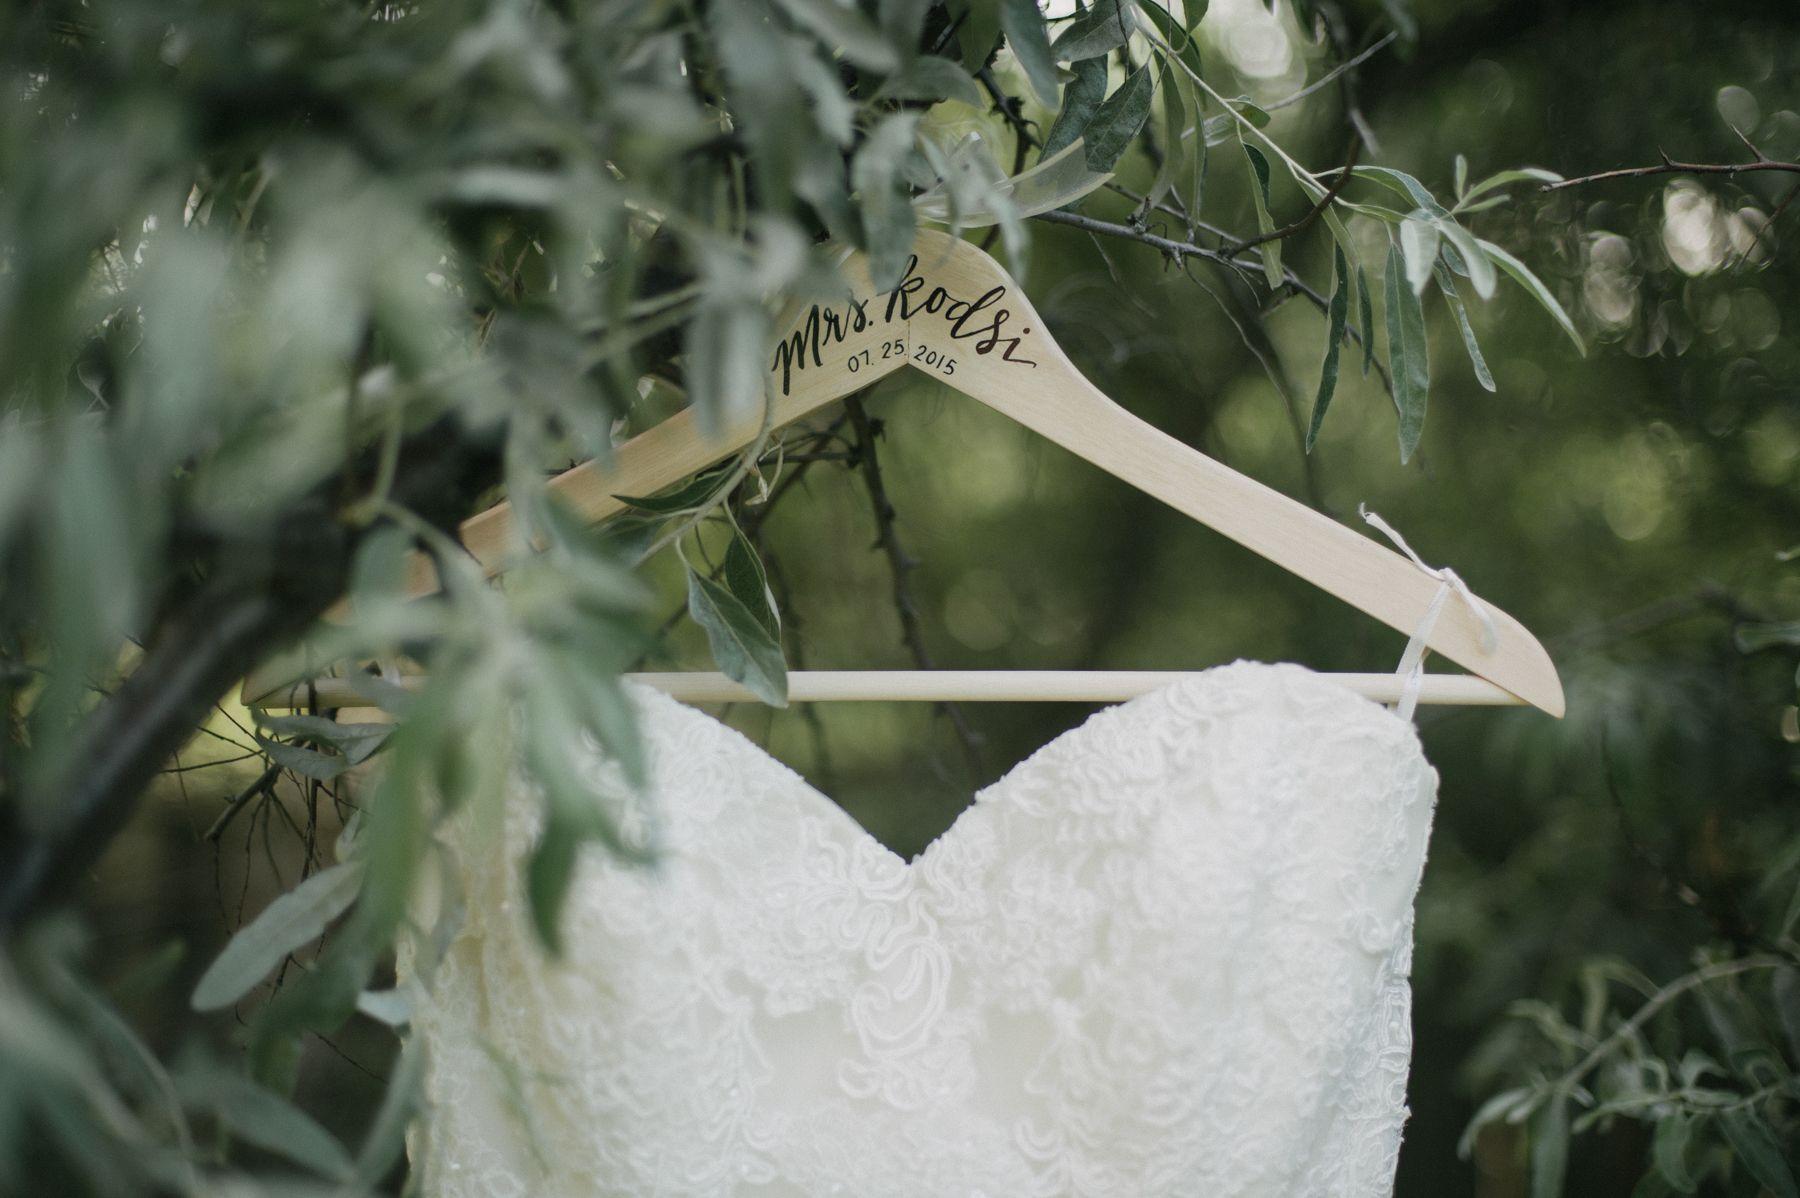 Daring Wanderer Photography - Daring Wanderer - Vintage wedding inspiration - Toronto wedding photographer - romantic toronto wedding - apple orchard wedding portraits - orchard wedding portraits - outdoor bridal portraits - egyptian wedding photographer